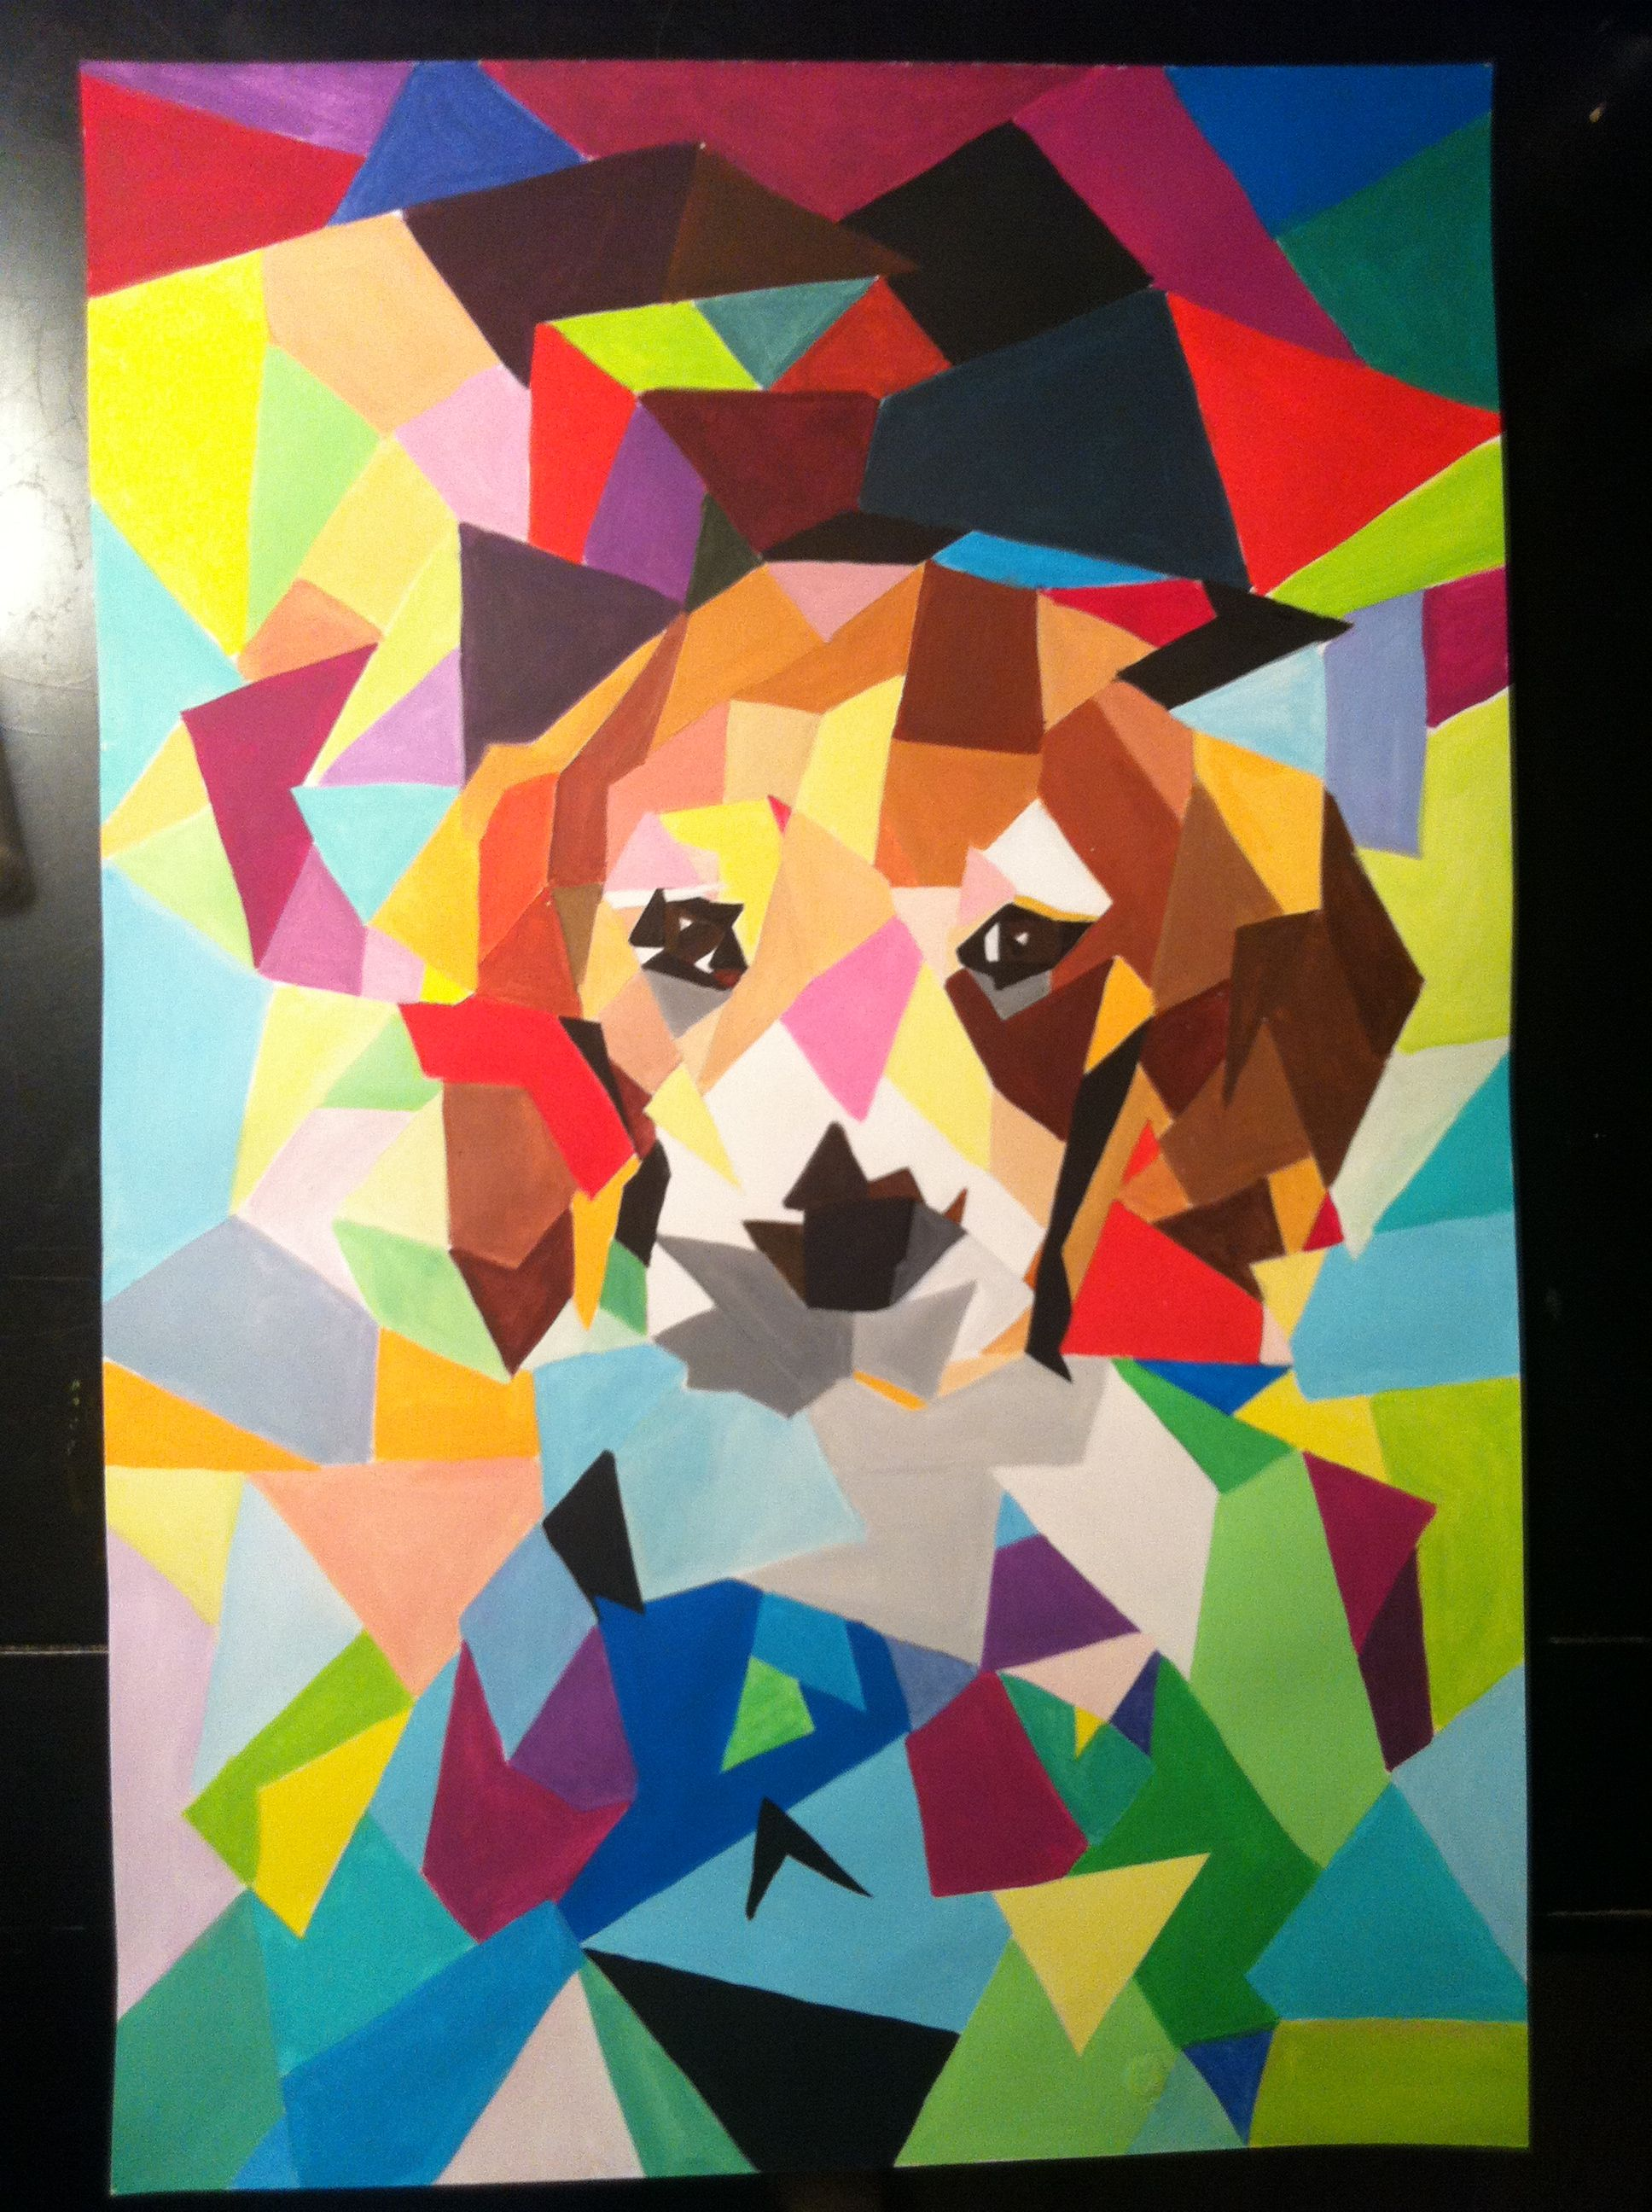 Cubism | Art Movements (Art Project Examples) | Pinterest